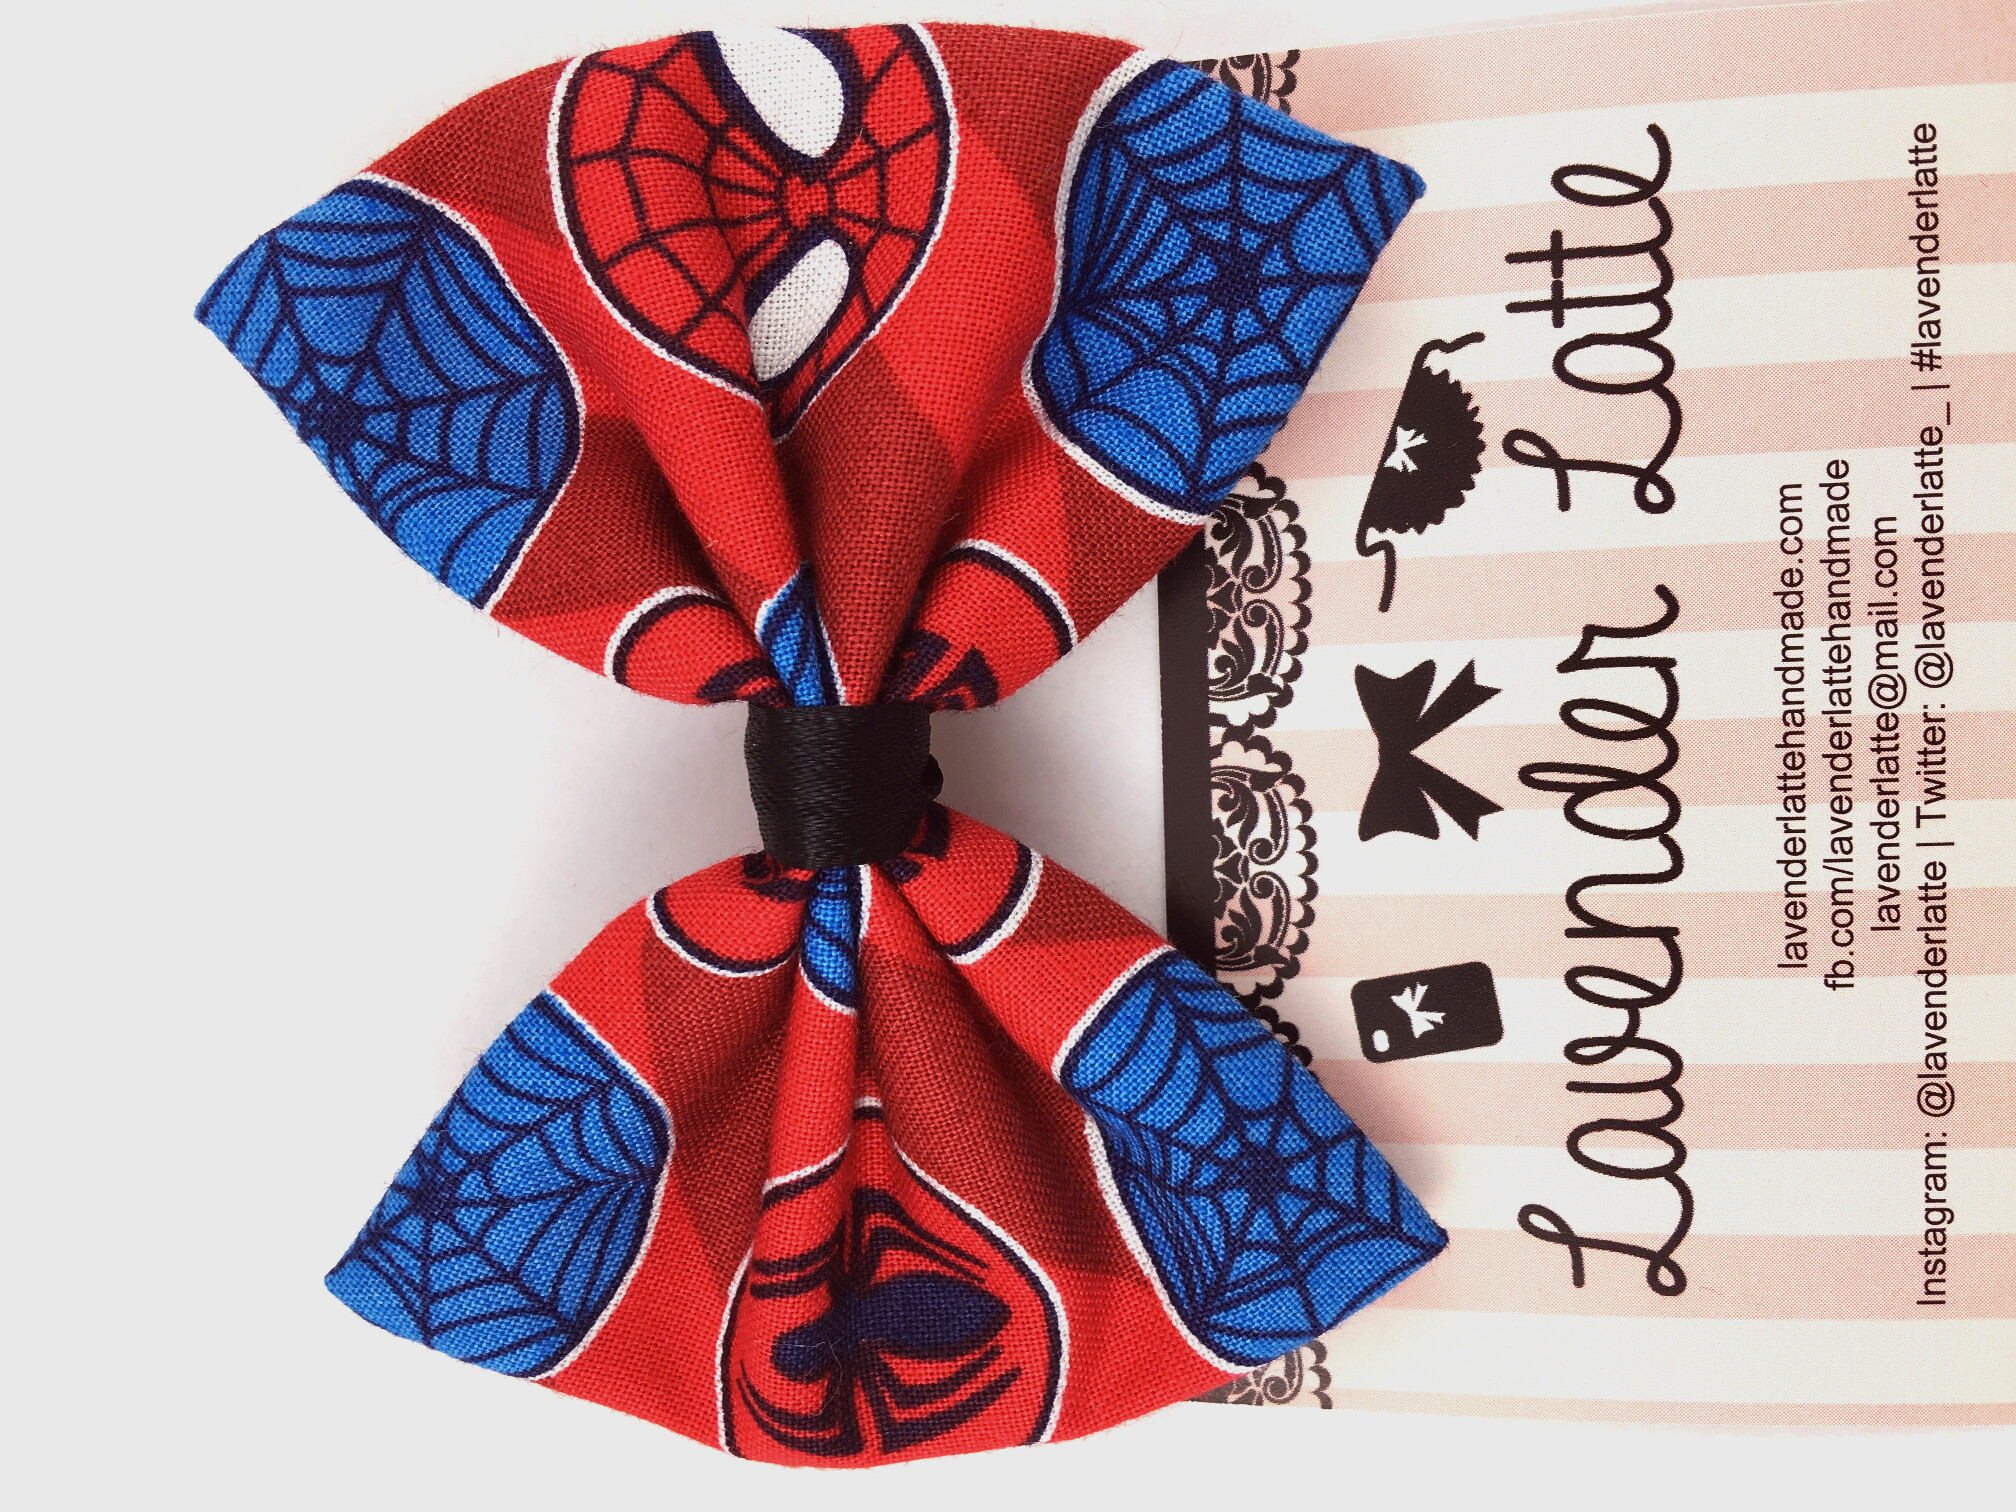 731de0a1cbf9 Spiderman Superhero Comic Book Handmade Hair Bow with Clip - Geeky ...